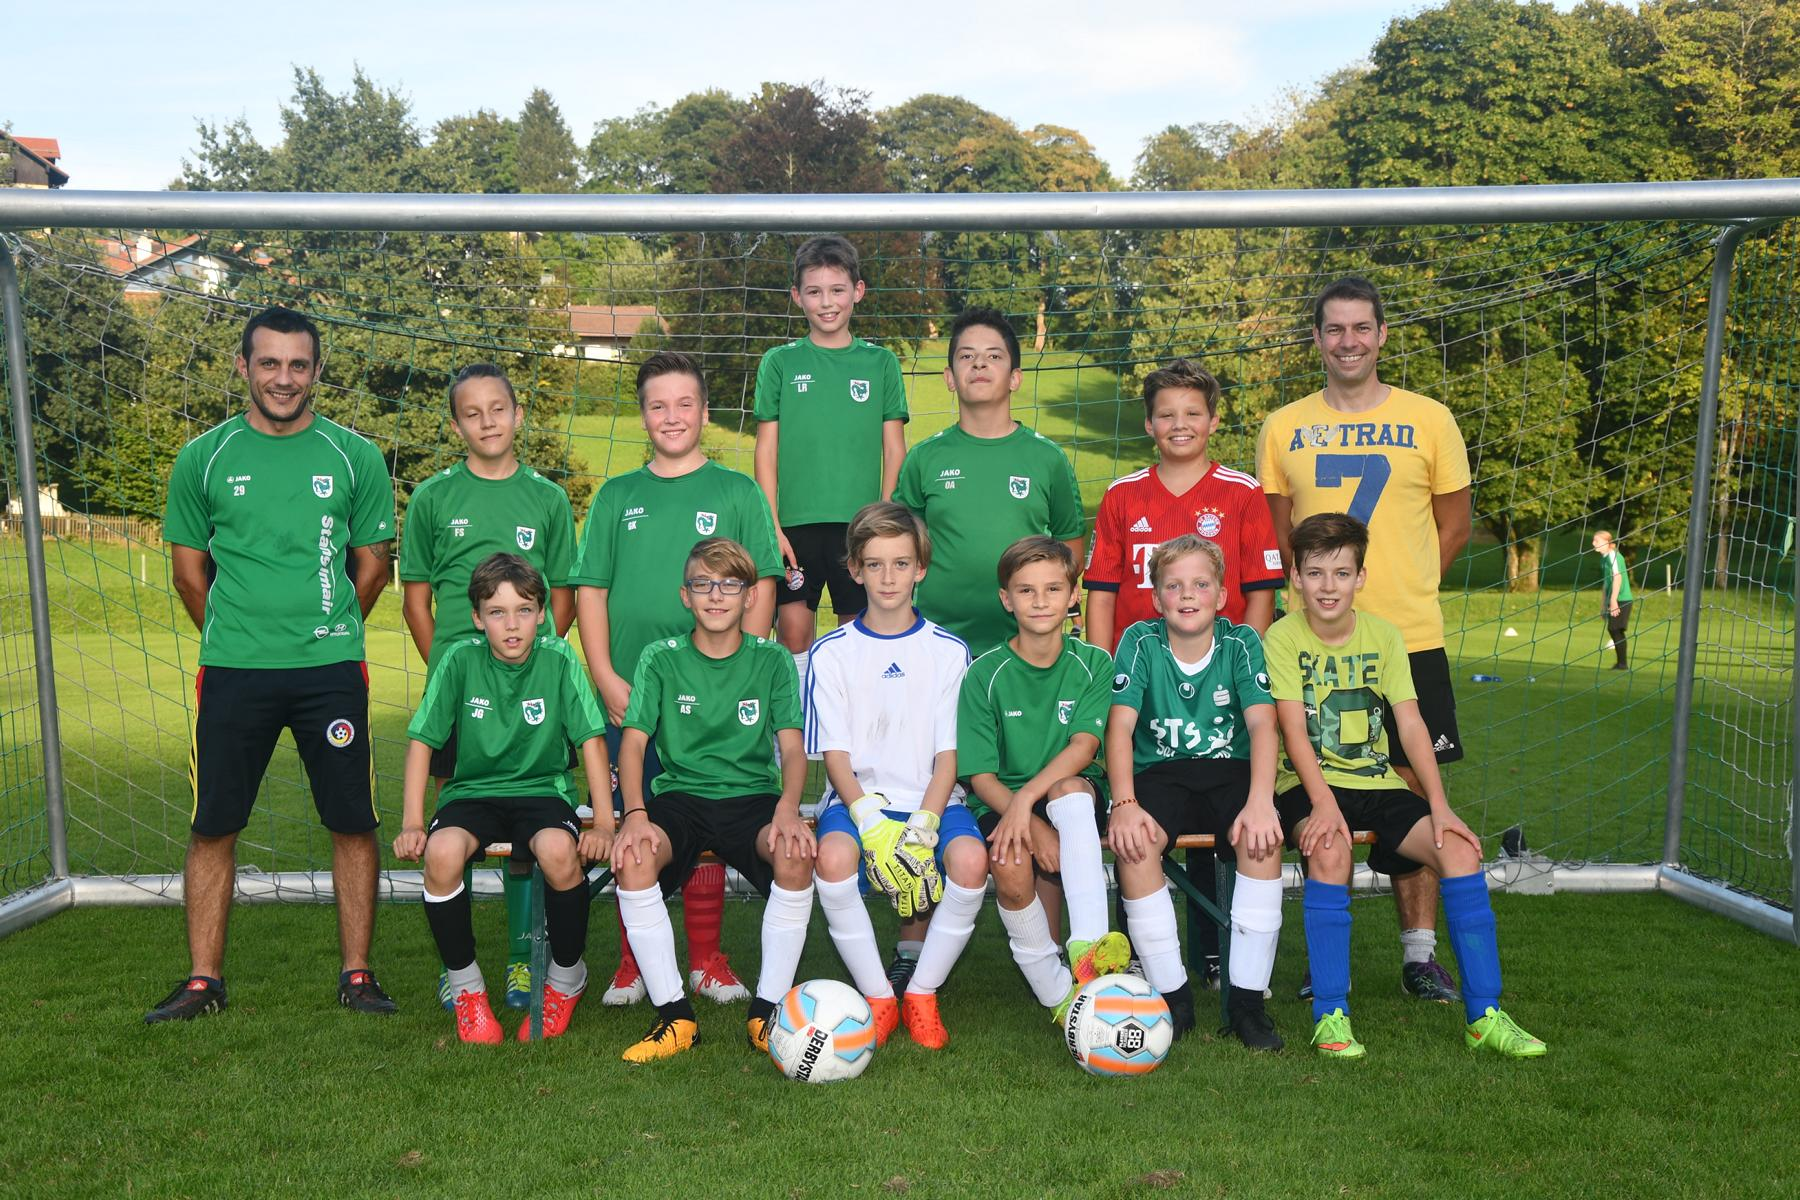 D3 Jugend U12 U13 2019 2020 Tsv Murnau Fussball